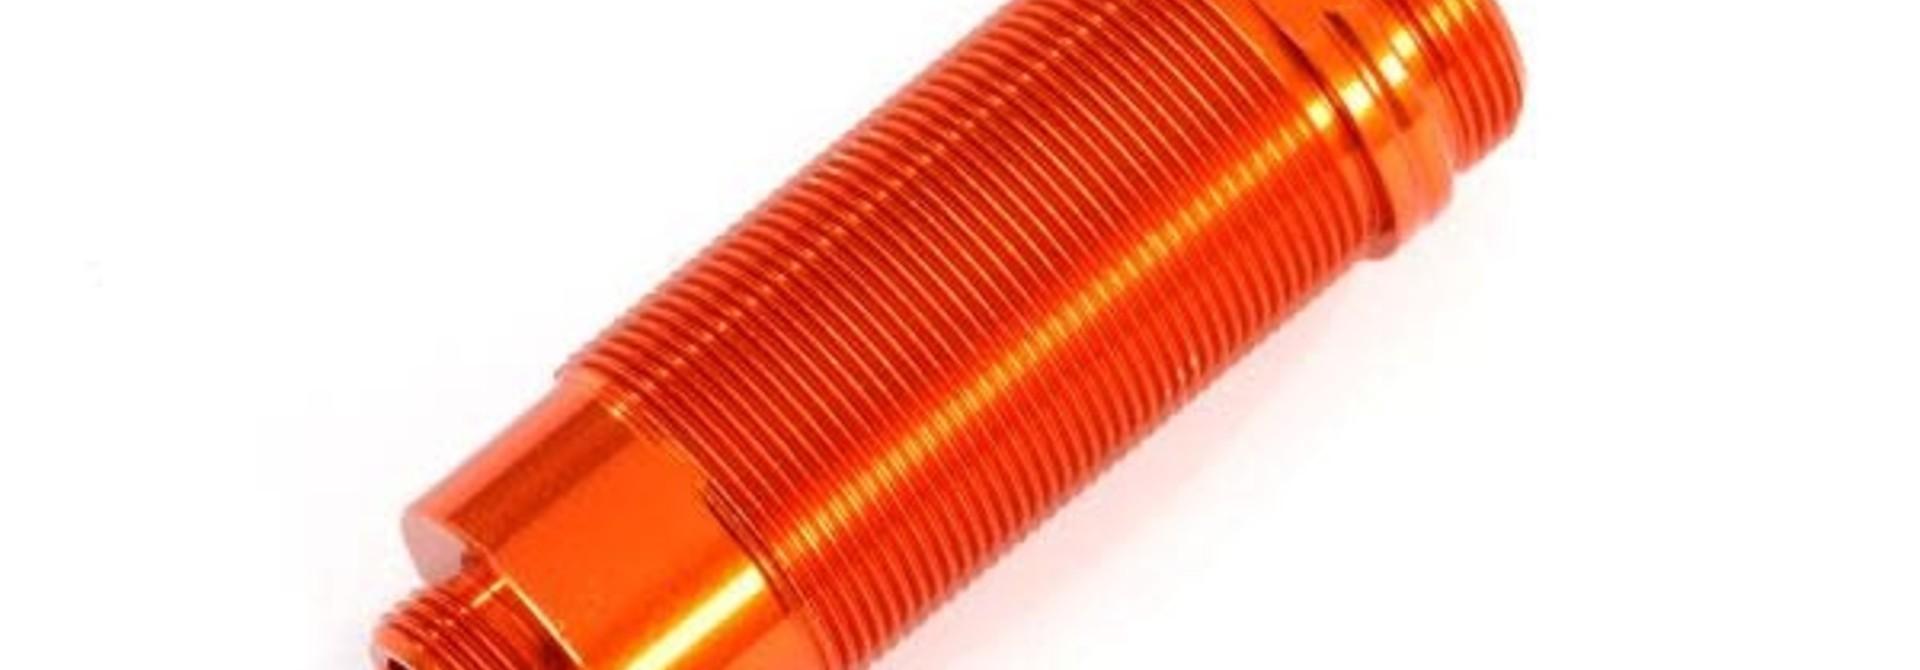 Body, GTR xx-long shock, aluminum (orange-anodized) (PTFE-coated bodies) (1)